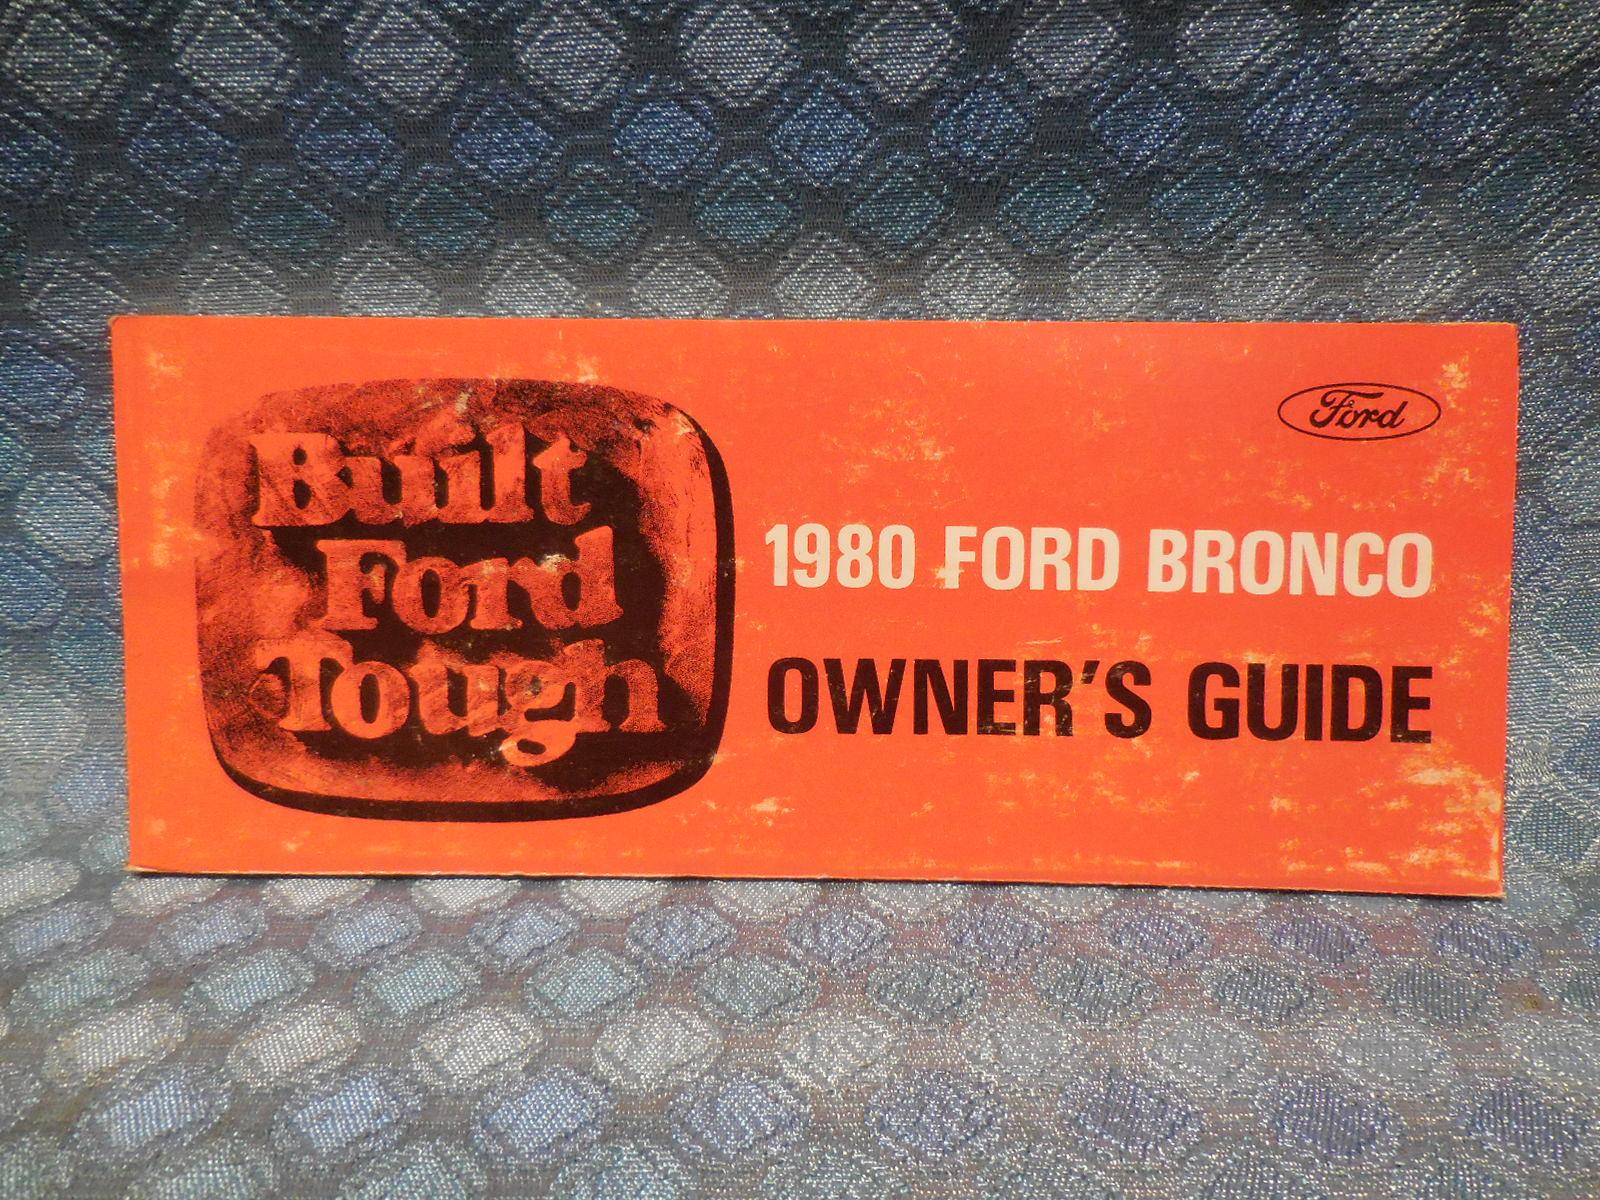 1980 Ford Bronco Nos Owners Manual Texas Parts Llc Antique Carburetor